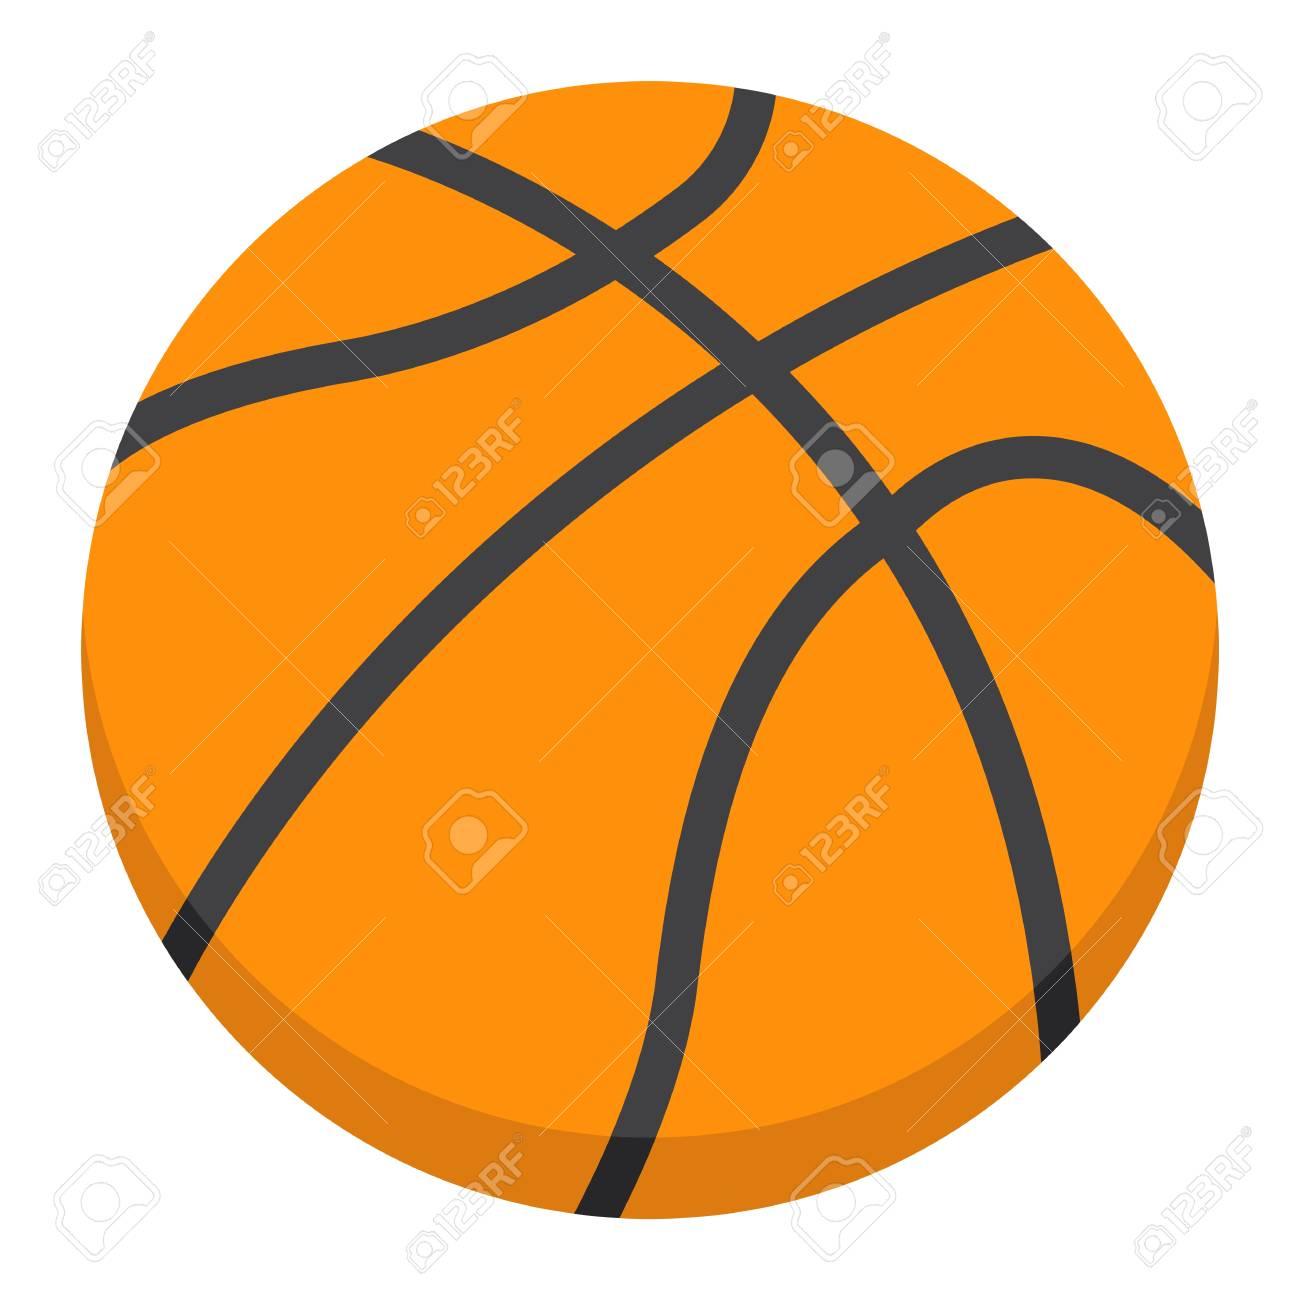 1300x1300 Free Basketball Ball Clip Art Tranzeo Wireless Technologies Inc